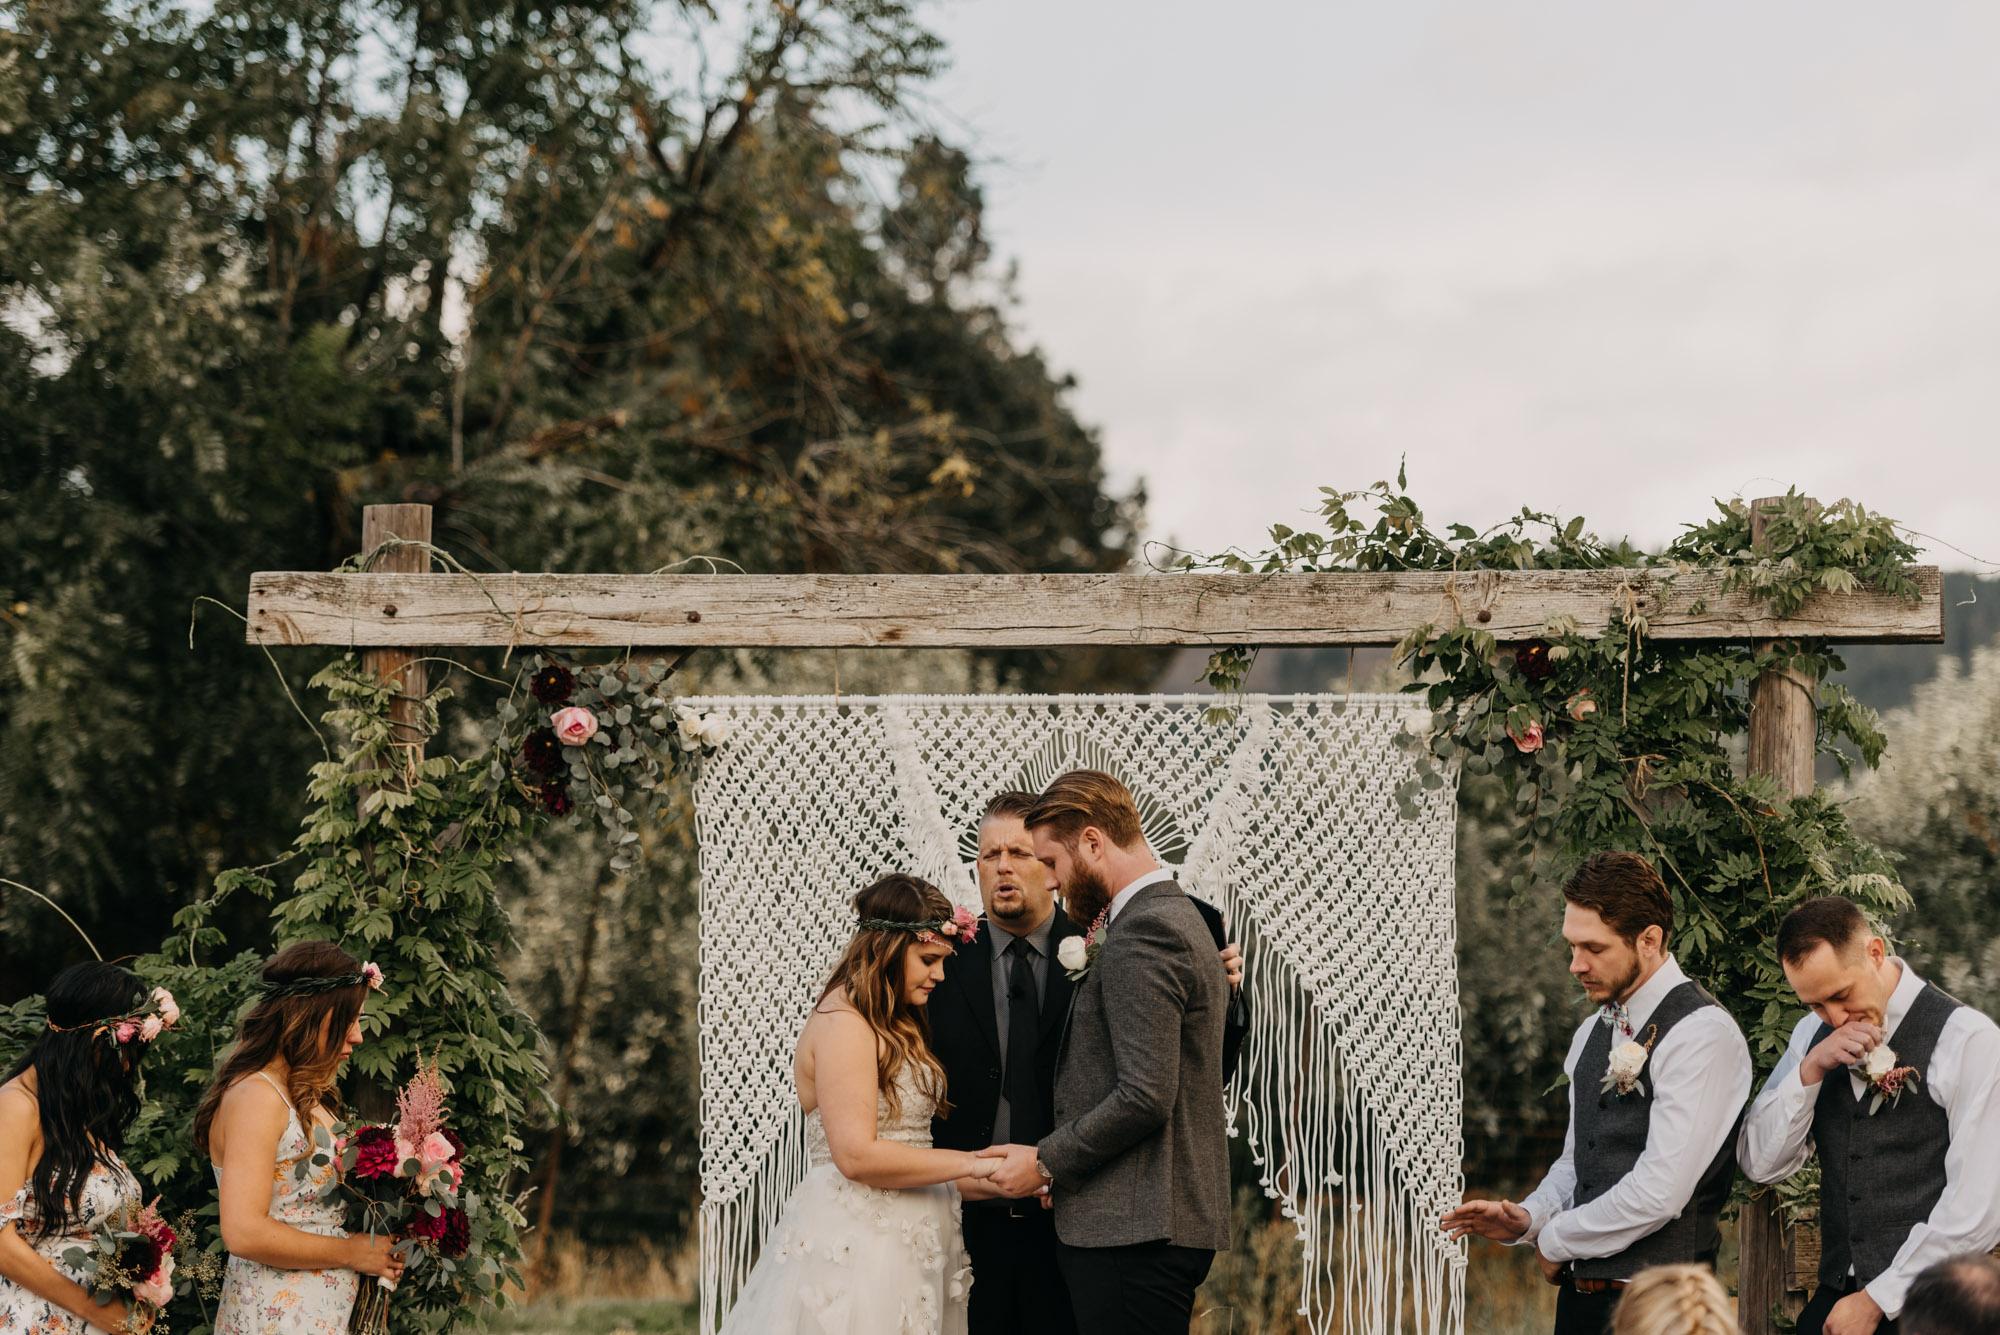 Outdoor-Summer-Ceremony-Washington-Wedding-Rainbow-9122.jpg